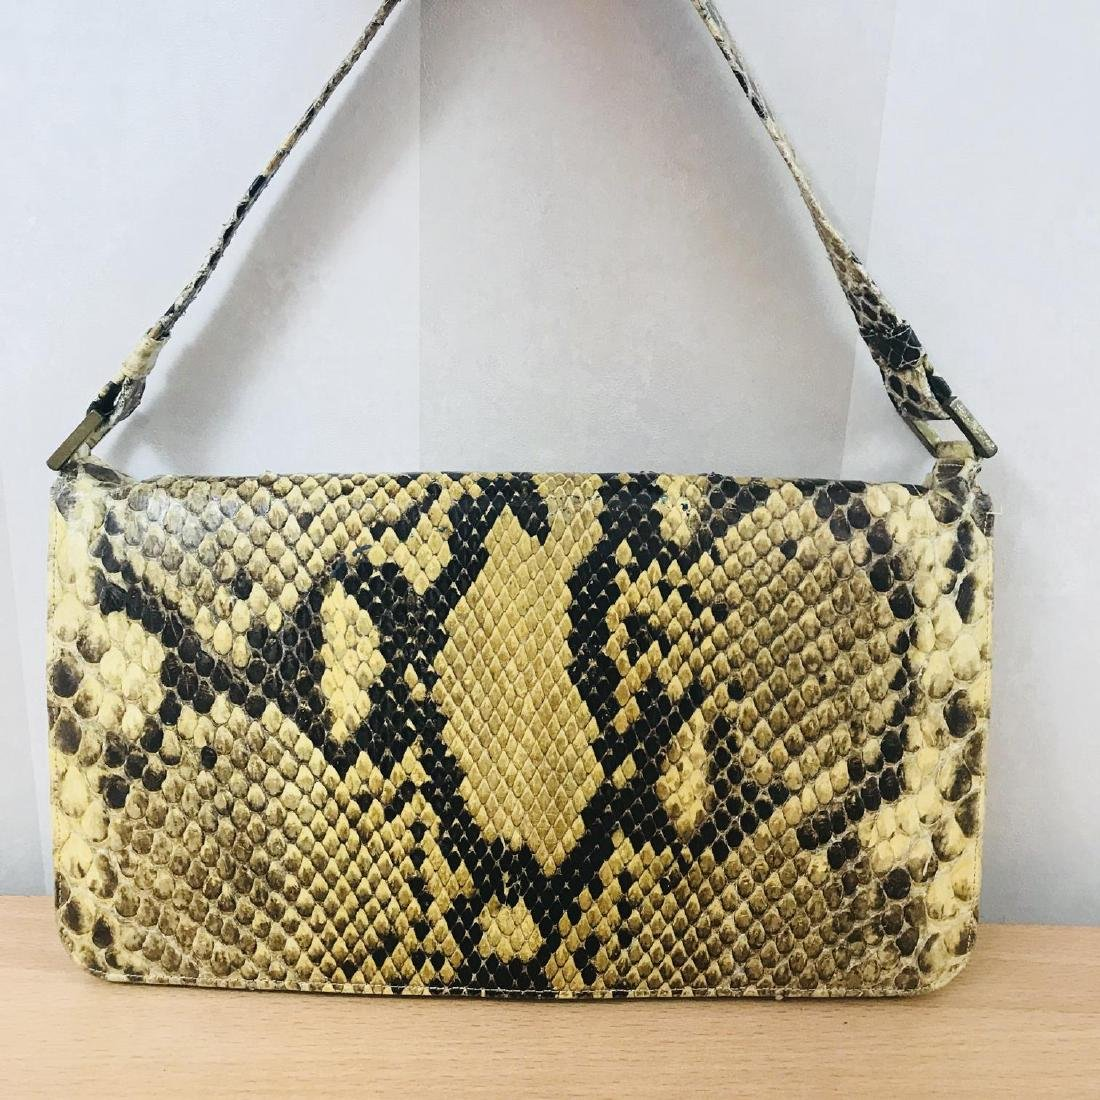 Vintage Snakeskin Leather Handbag